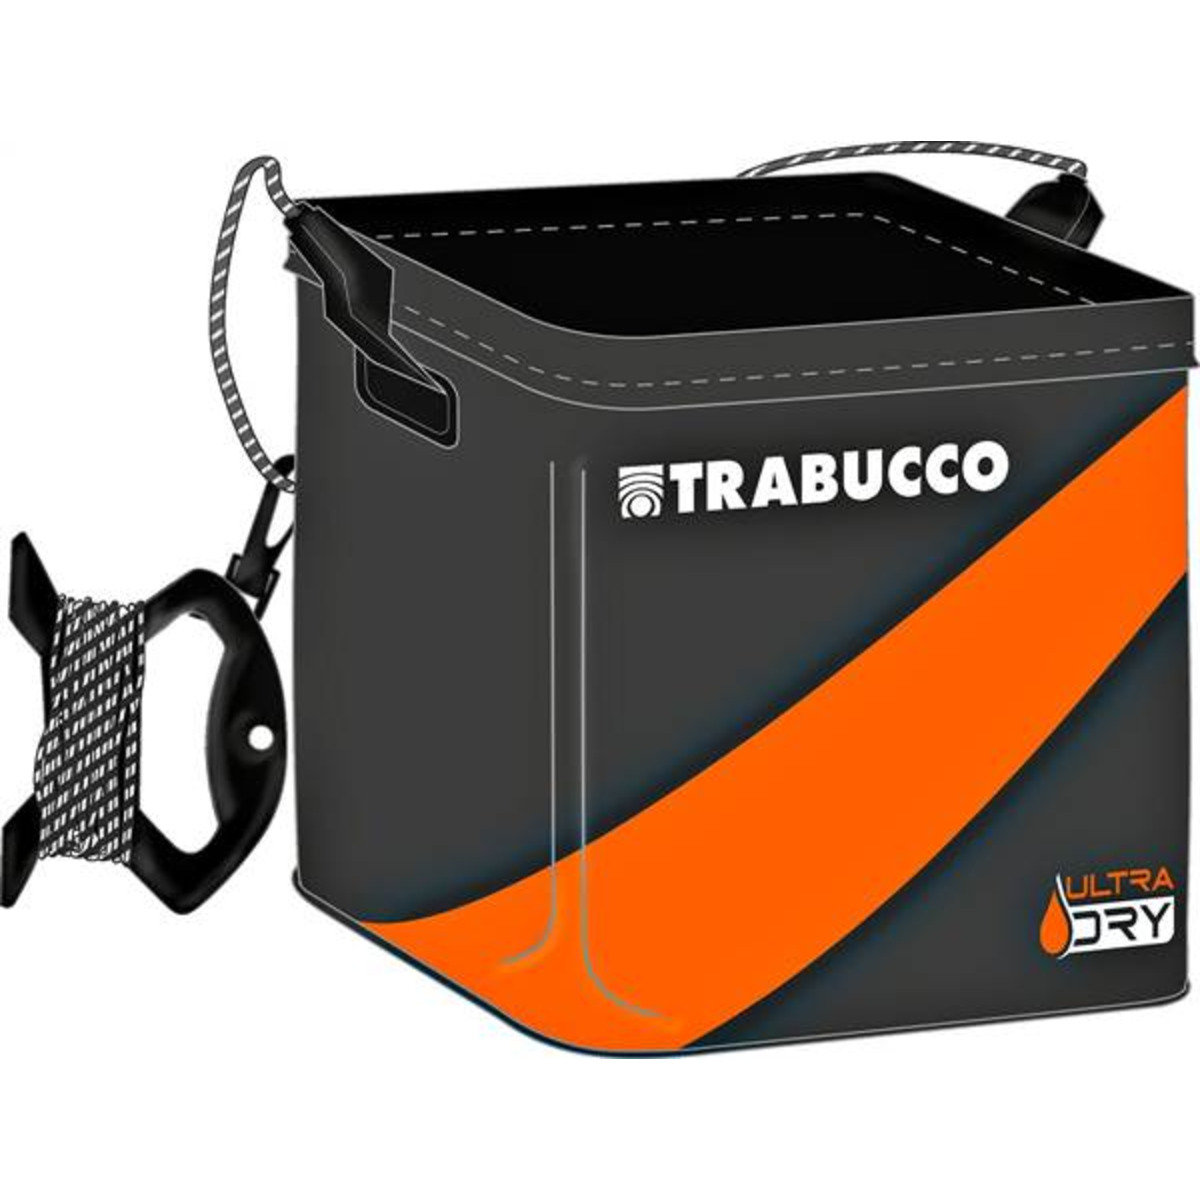 Trabucco Drop Bucket - 18x18x18 cm